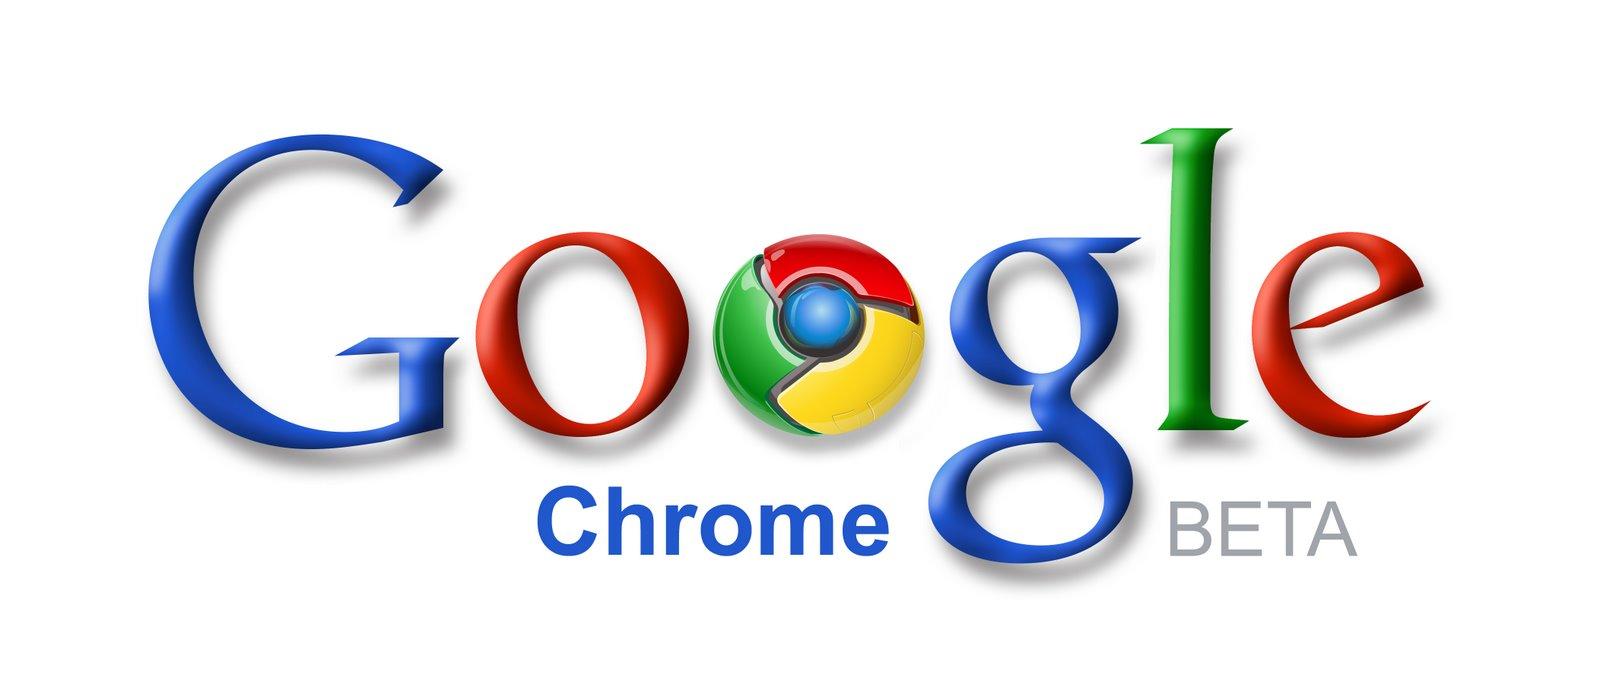 Download Google Chrome 24.0.1312.14 Beta Free